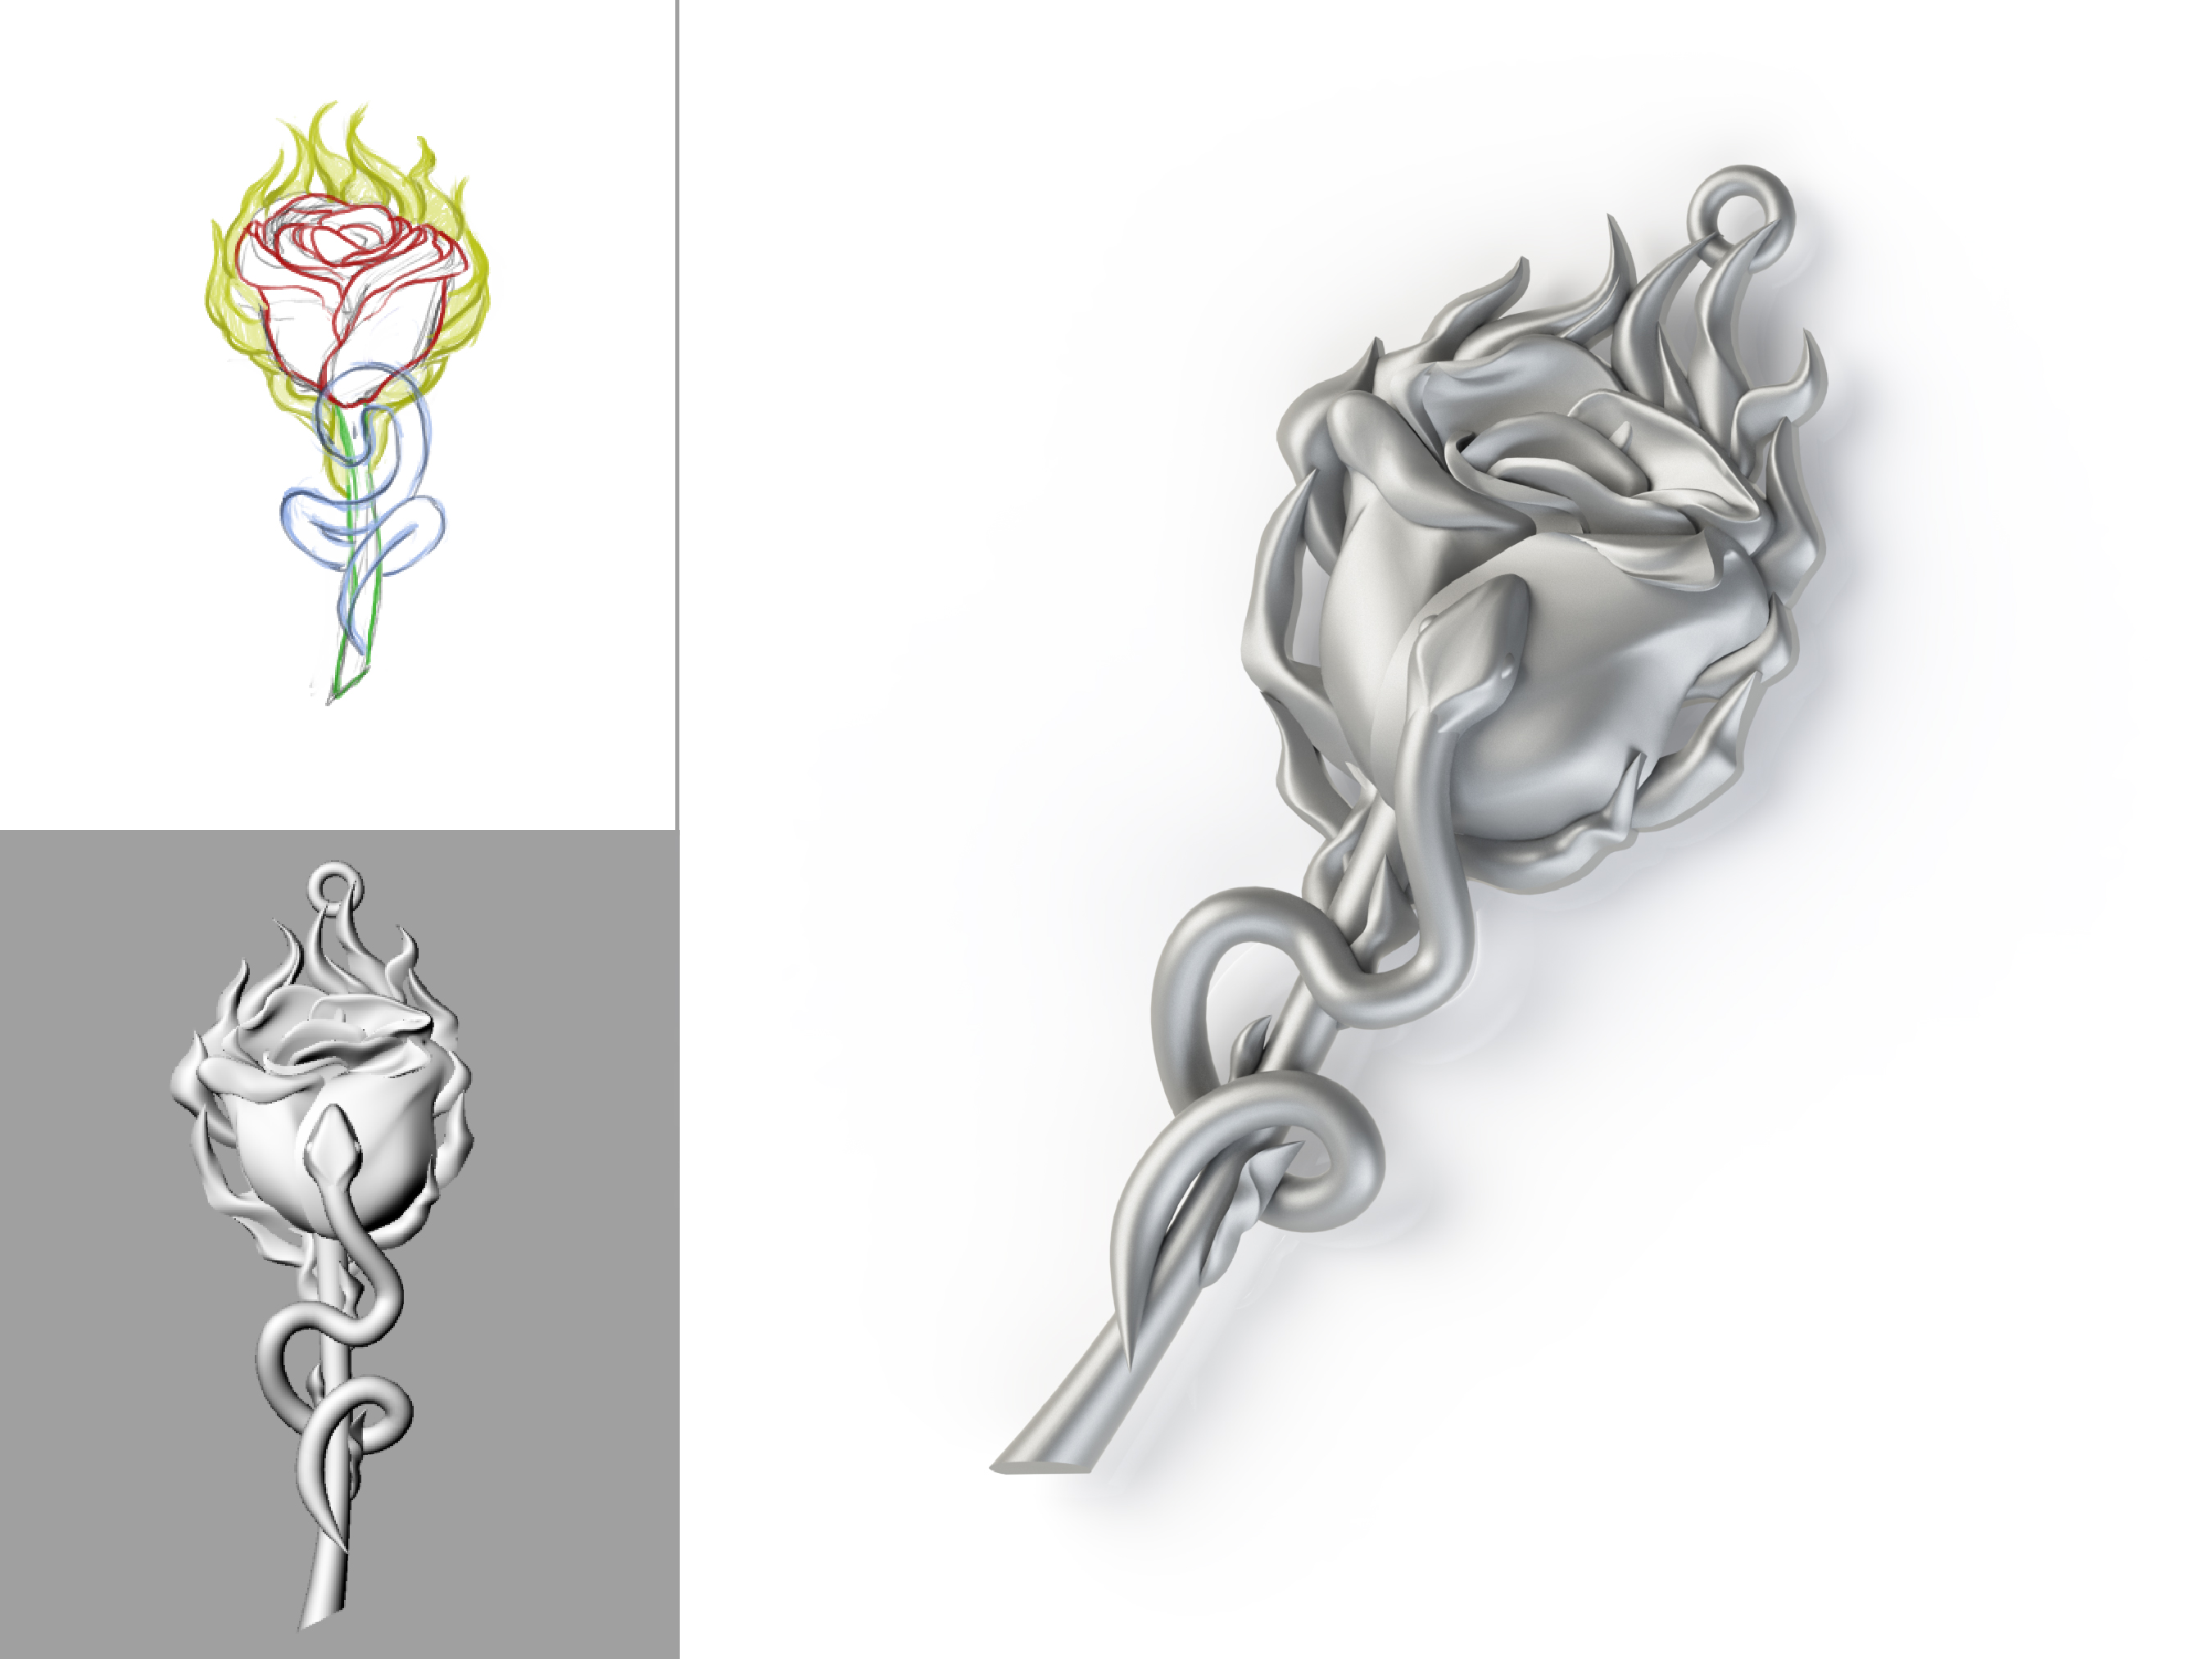 Silver Rose Necklace Design Sculpt